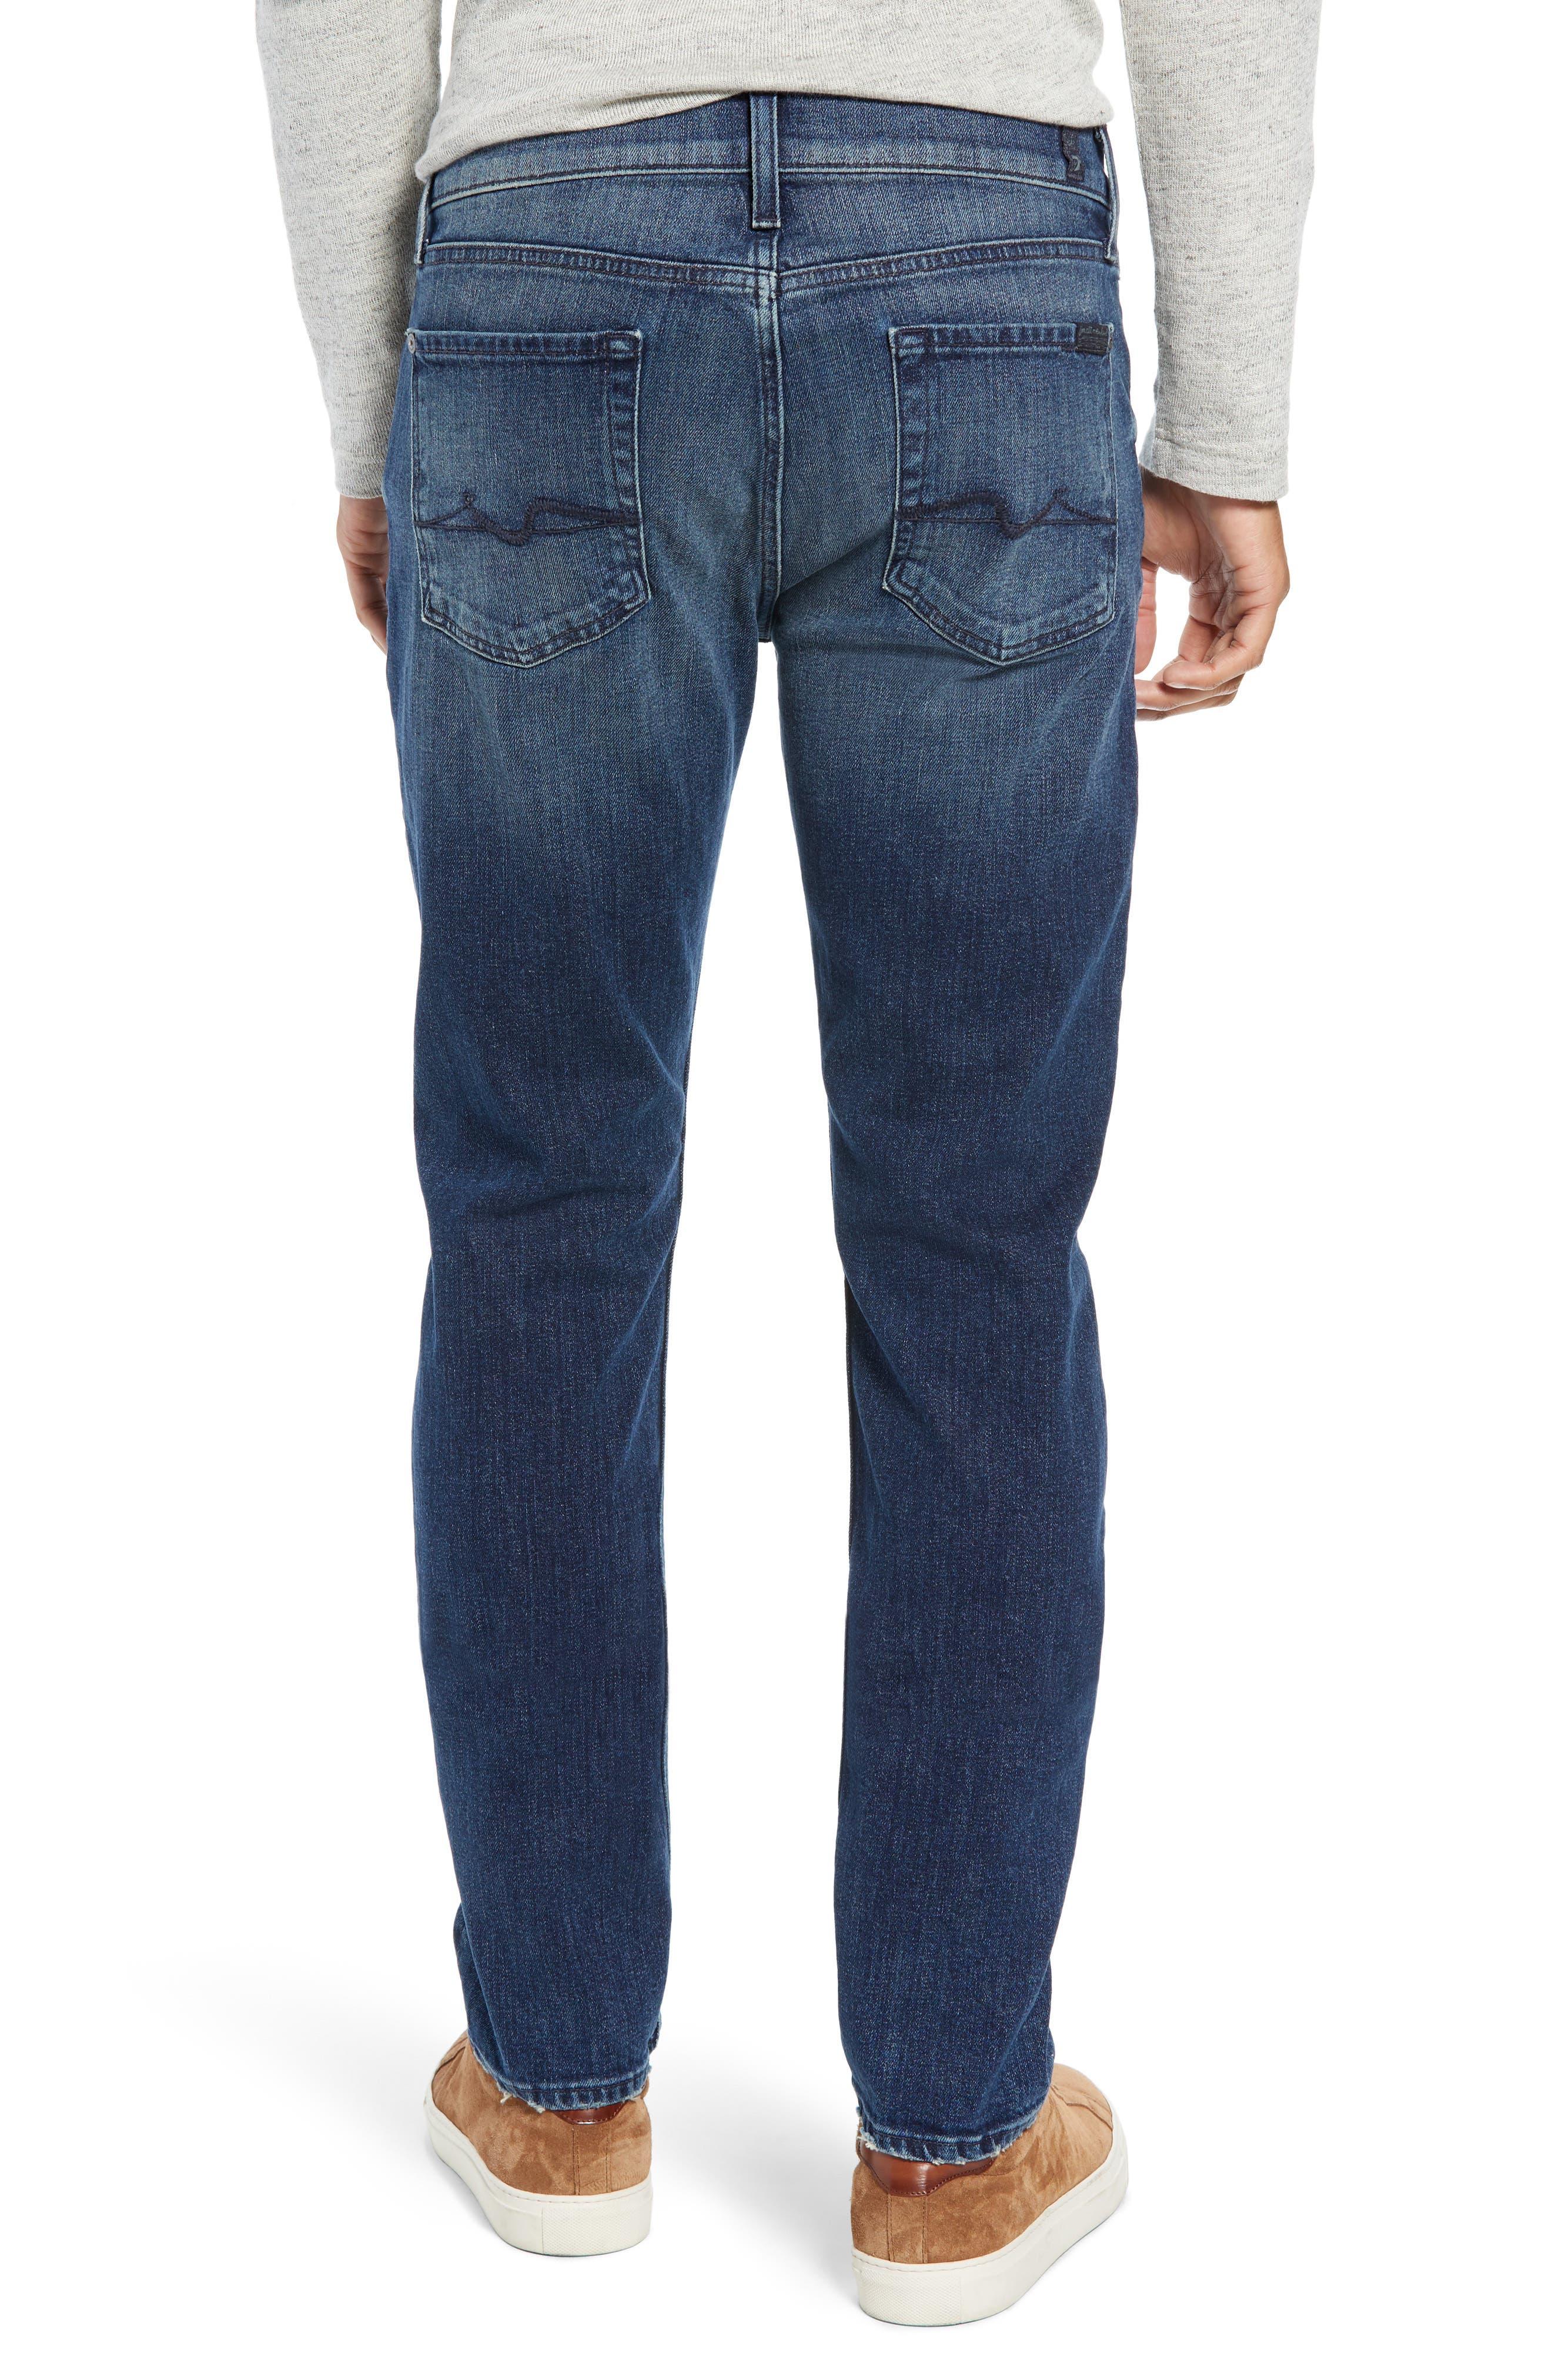 Slimmy Slim Fit Jeans,                             Alternate thumbnail 2, color,                             DRIFTER